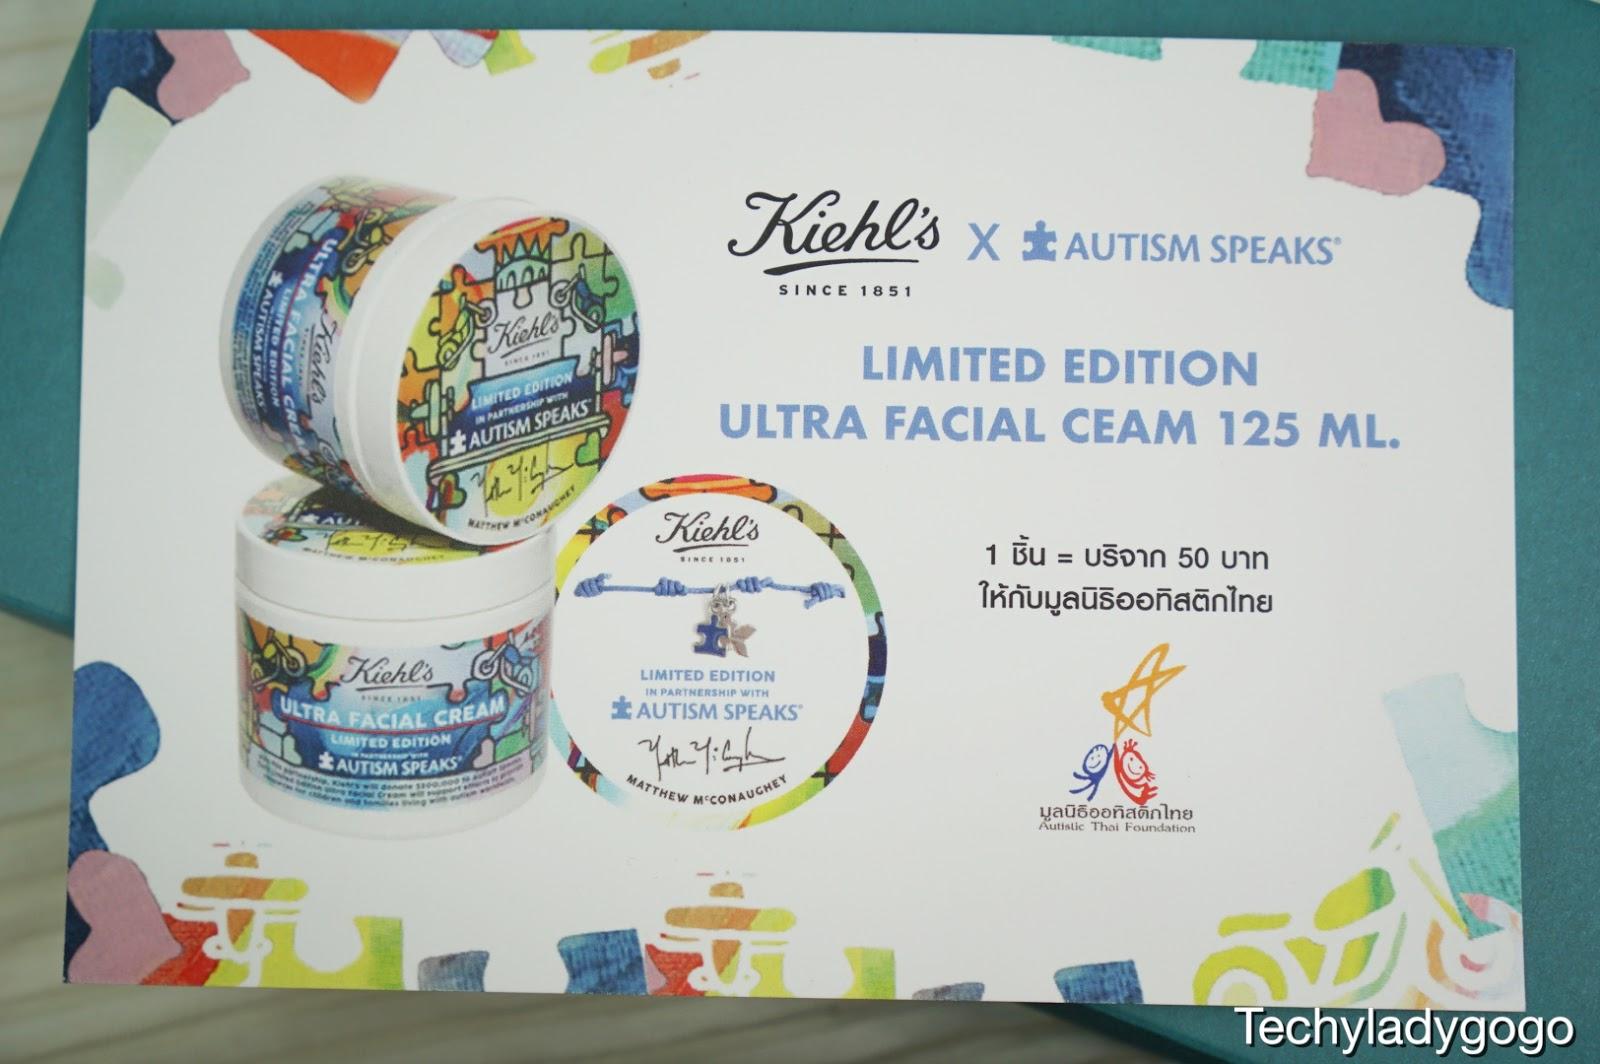 KIEHL'S X AUTISM SPEAKS™ แคมเปญการกุศลระดับโลกประจำปี 2017 ของคีลส์ จัดทำ Kiehl's x Matthew McConaughey Ultra Facial Cream Limited Edition และคีลส์ ประเทศไทยจะนำรายได้มอบให้กับมูลนิธิออทิสติกไทย